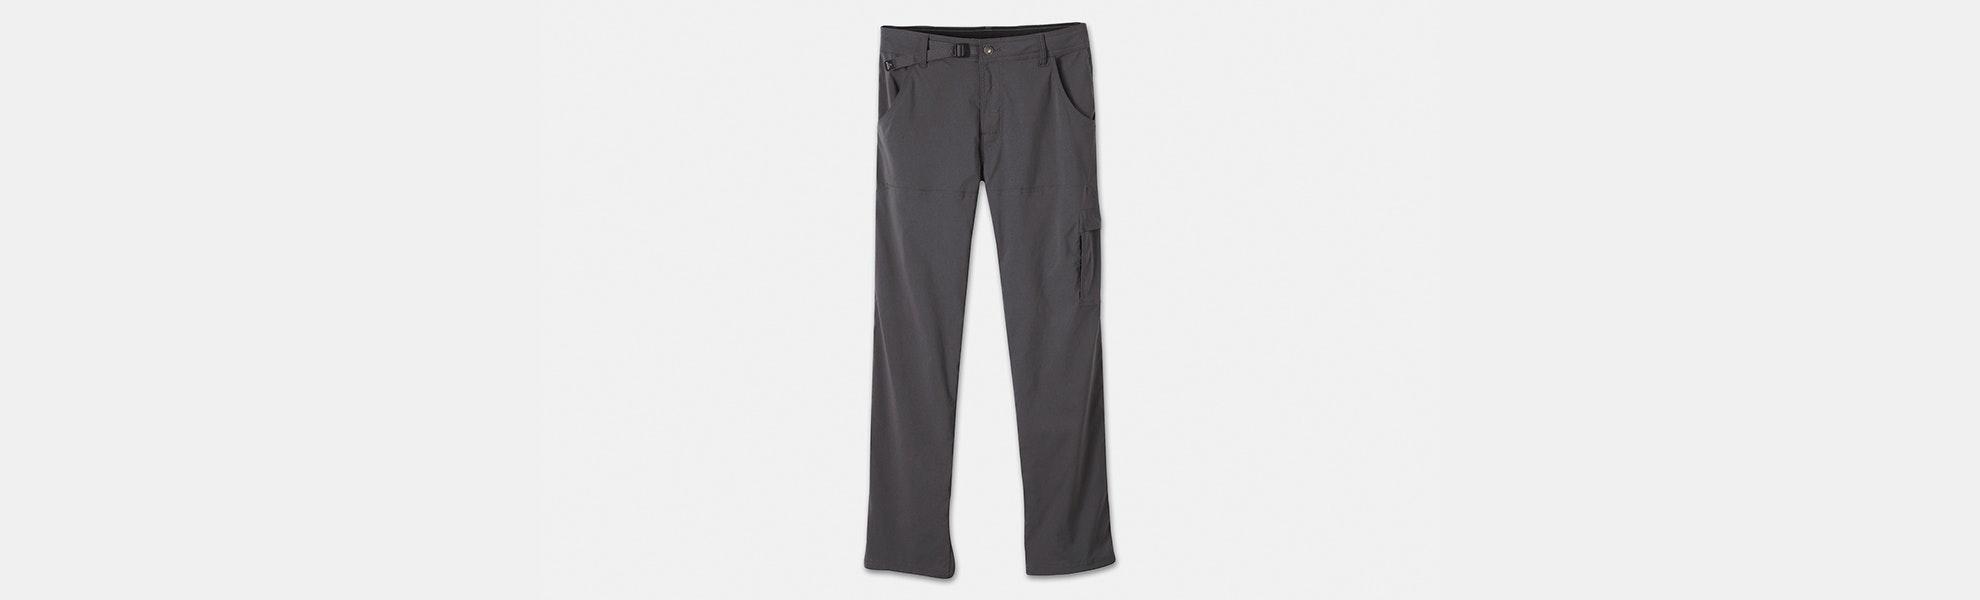 prAna Men's Stretch Zion Pant